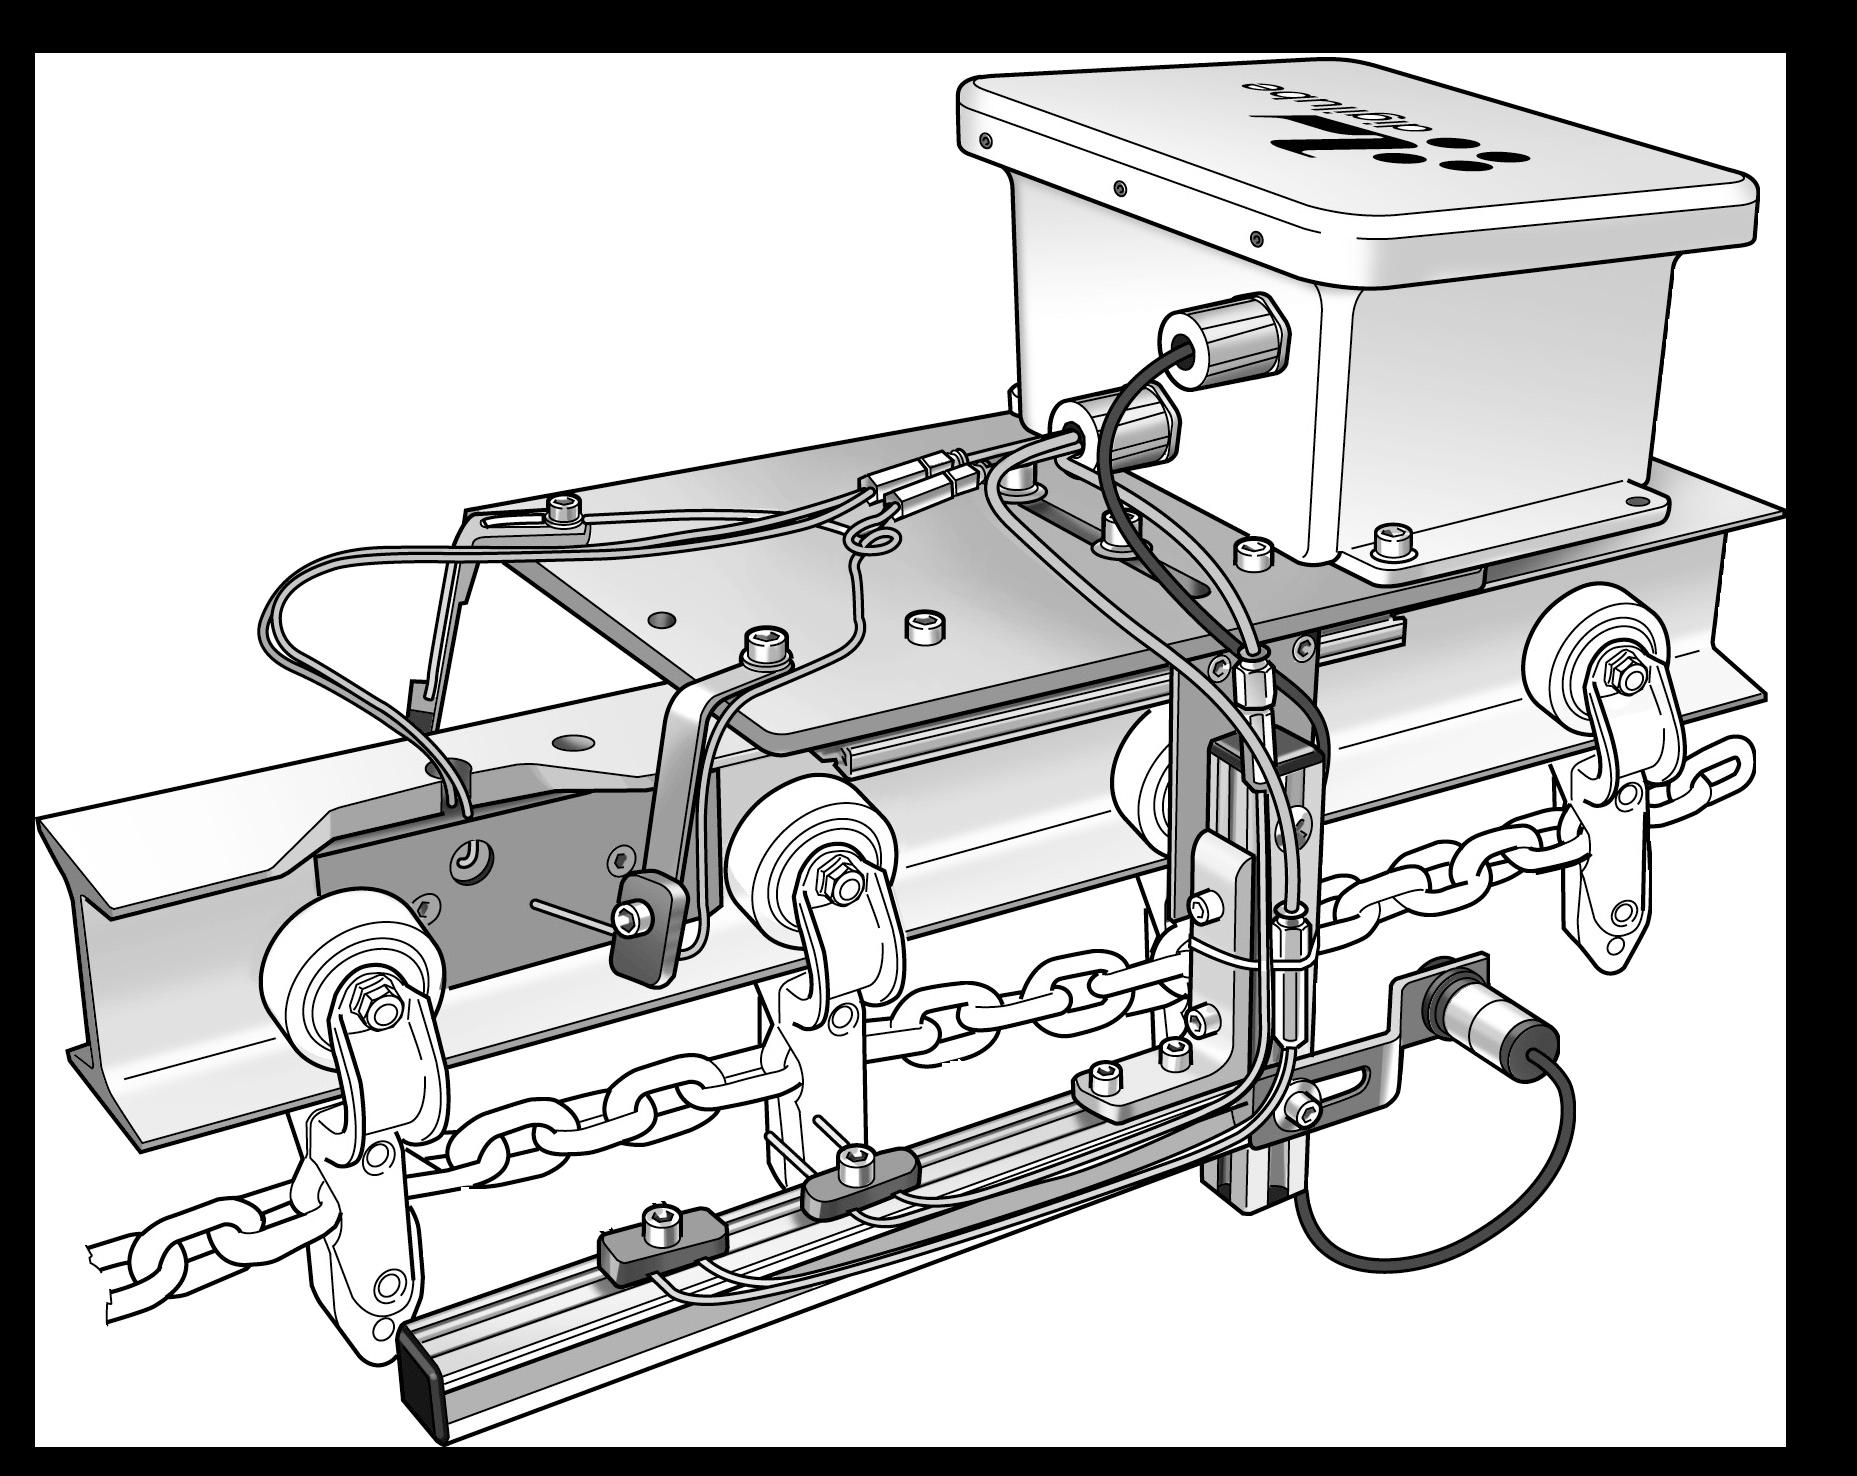 Logging Chain Lubricator